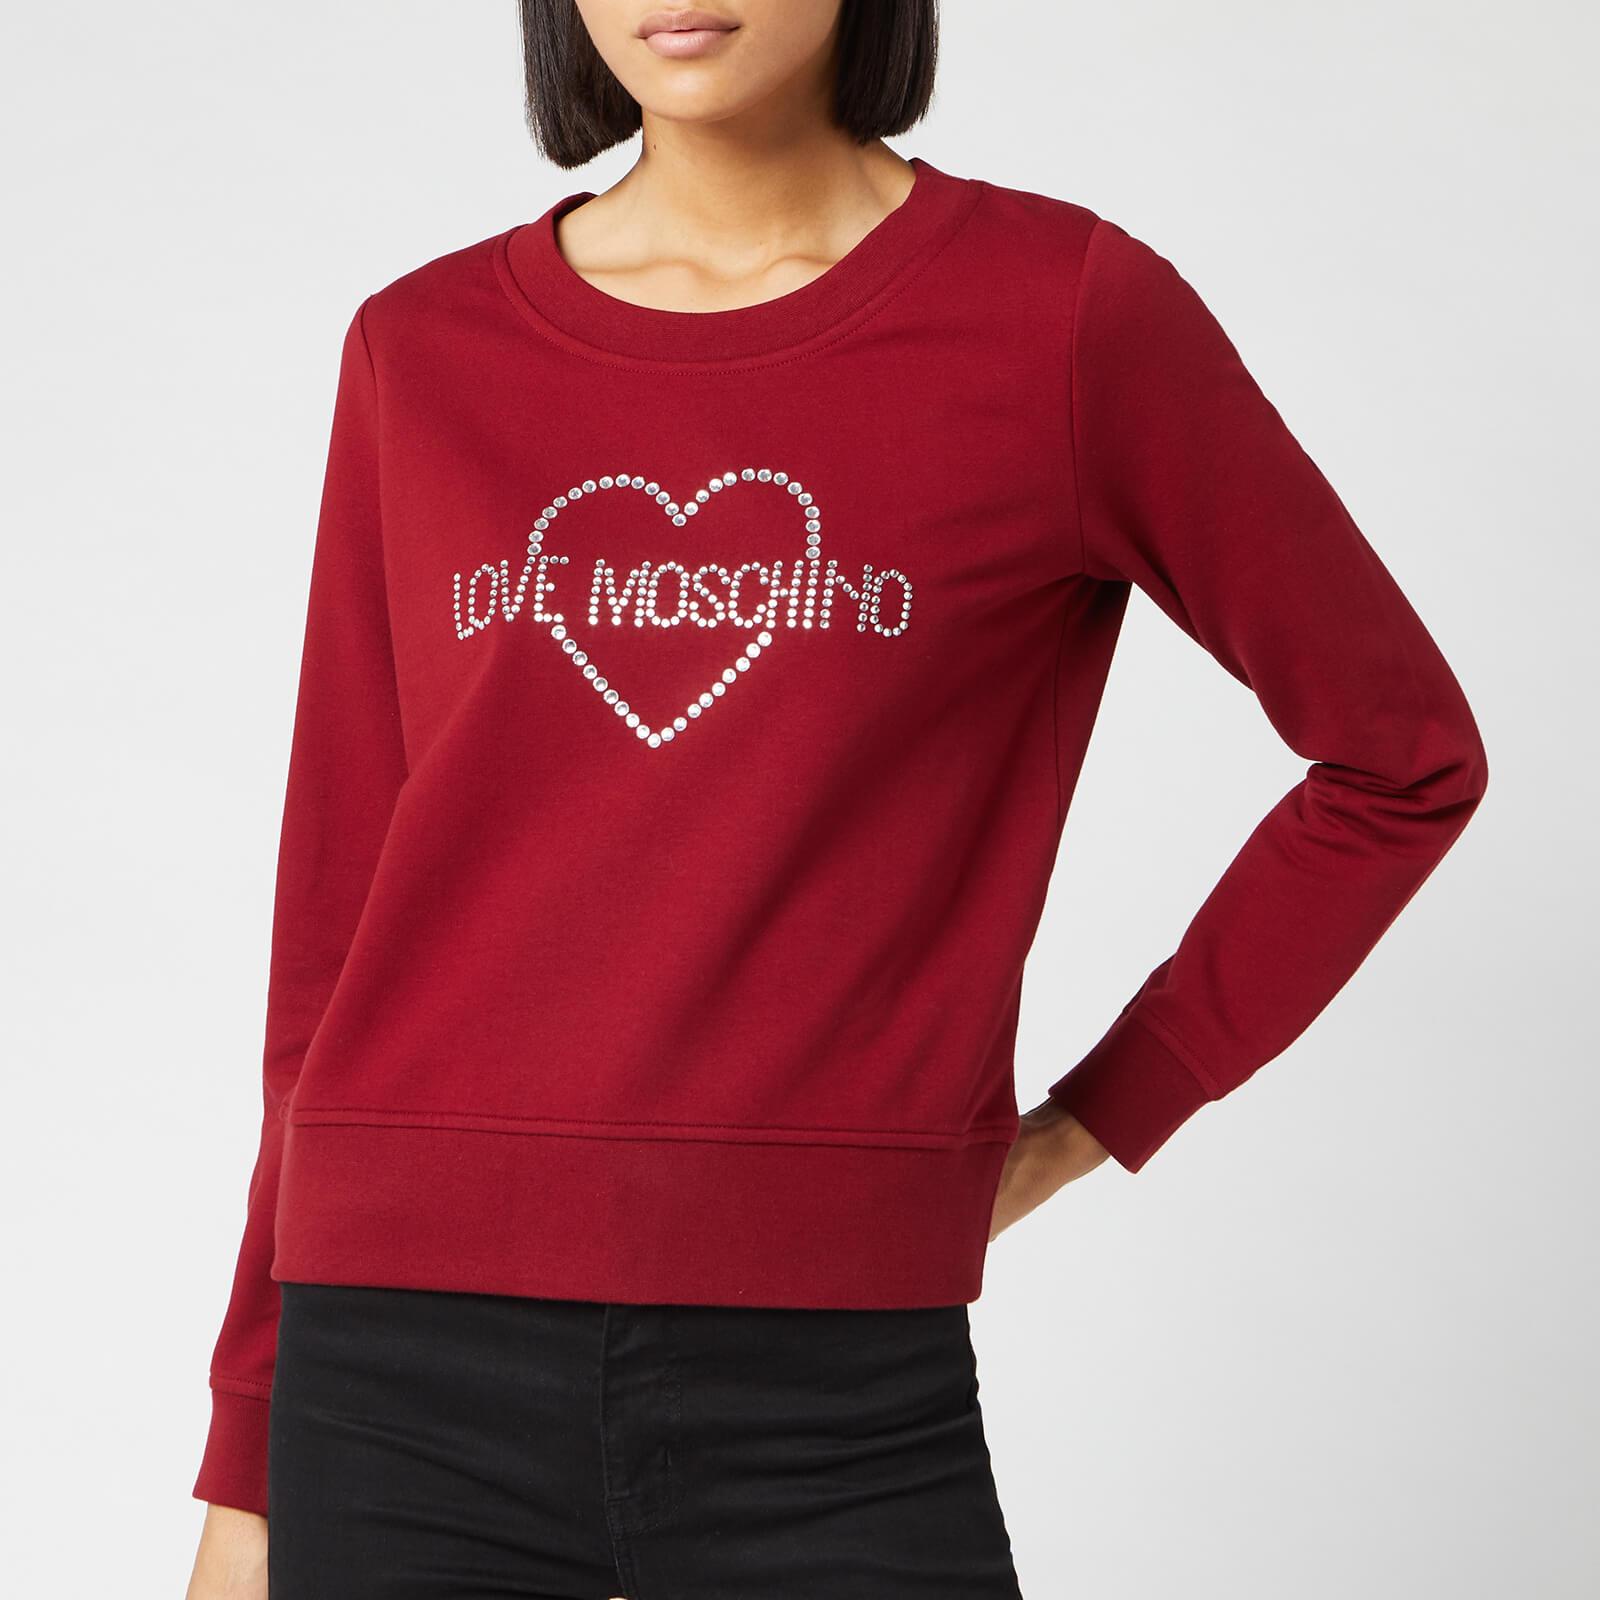 Moschino Love Moschino Women's Crystal Logo Sweater - Red - IT 44/UK 12 - Red